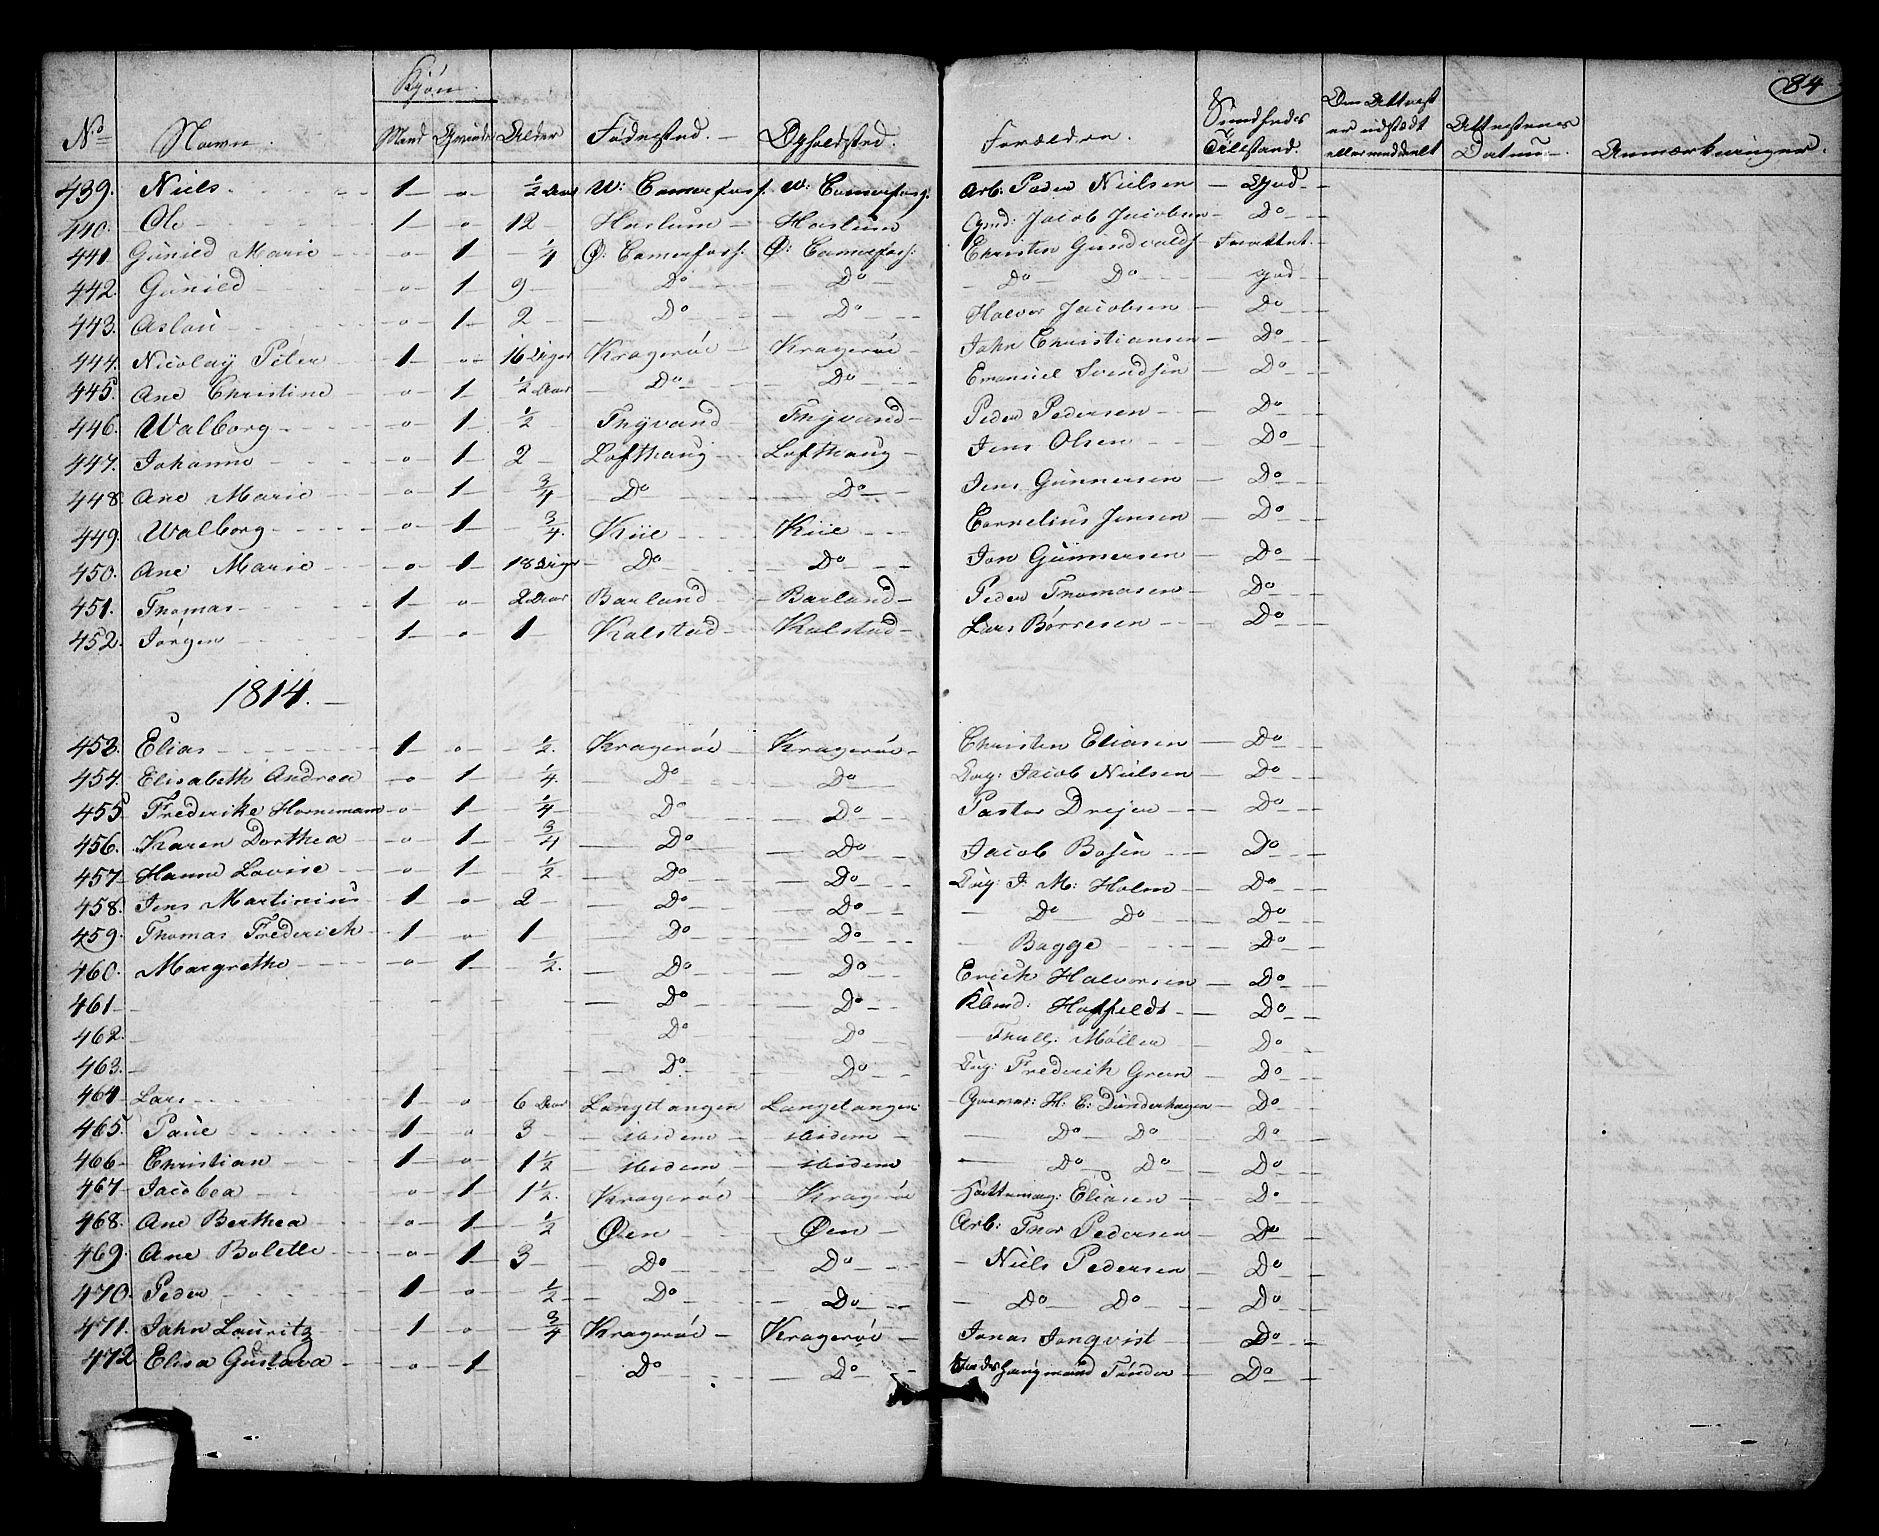 SAKO, Kragerø kirkebøker, F/Fa/L0003: Ministerialbok nr. 3, 1802-1813, s. 84